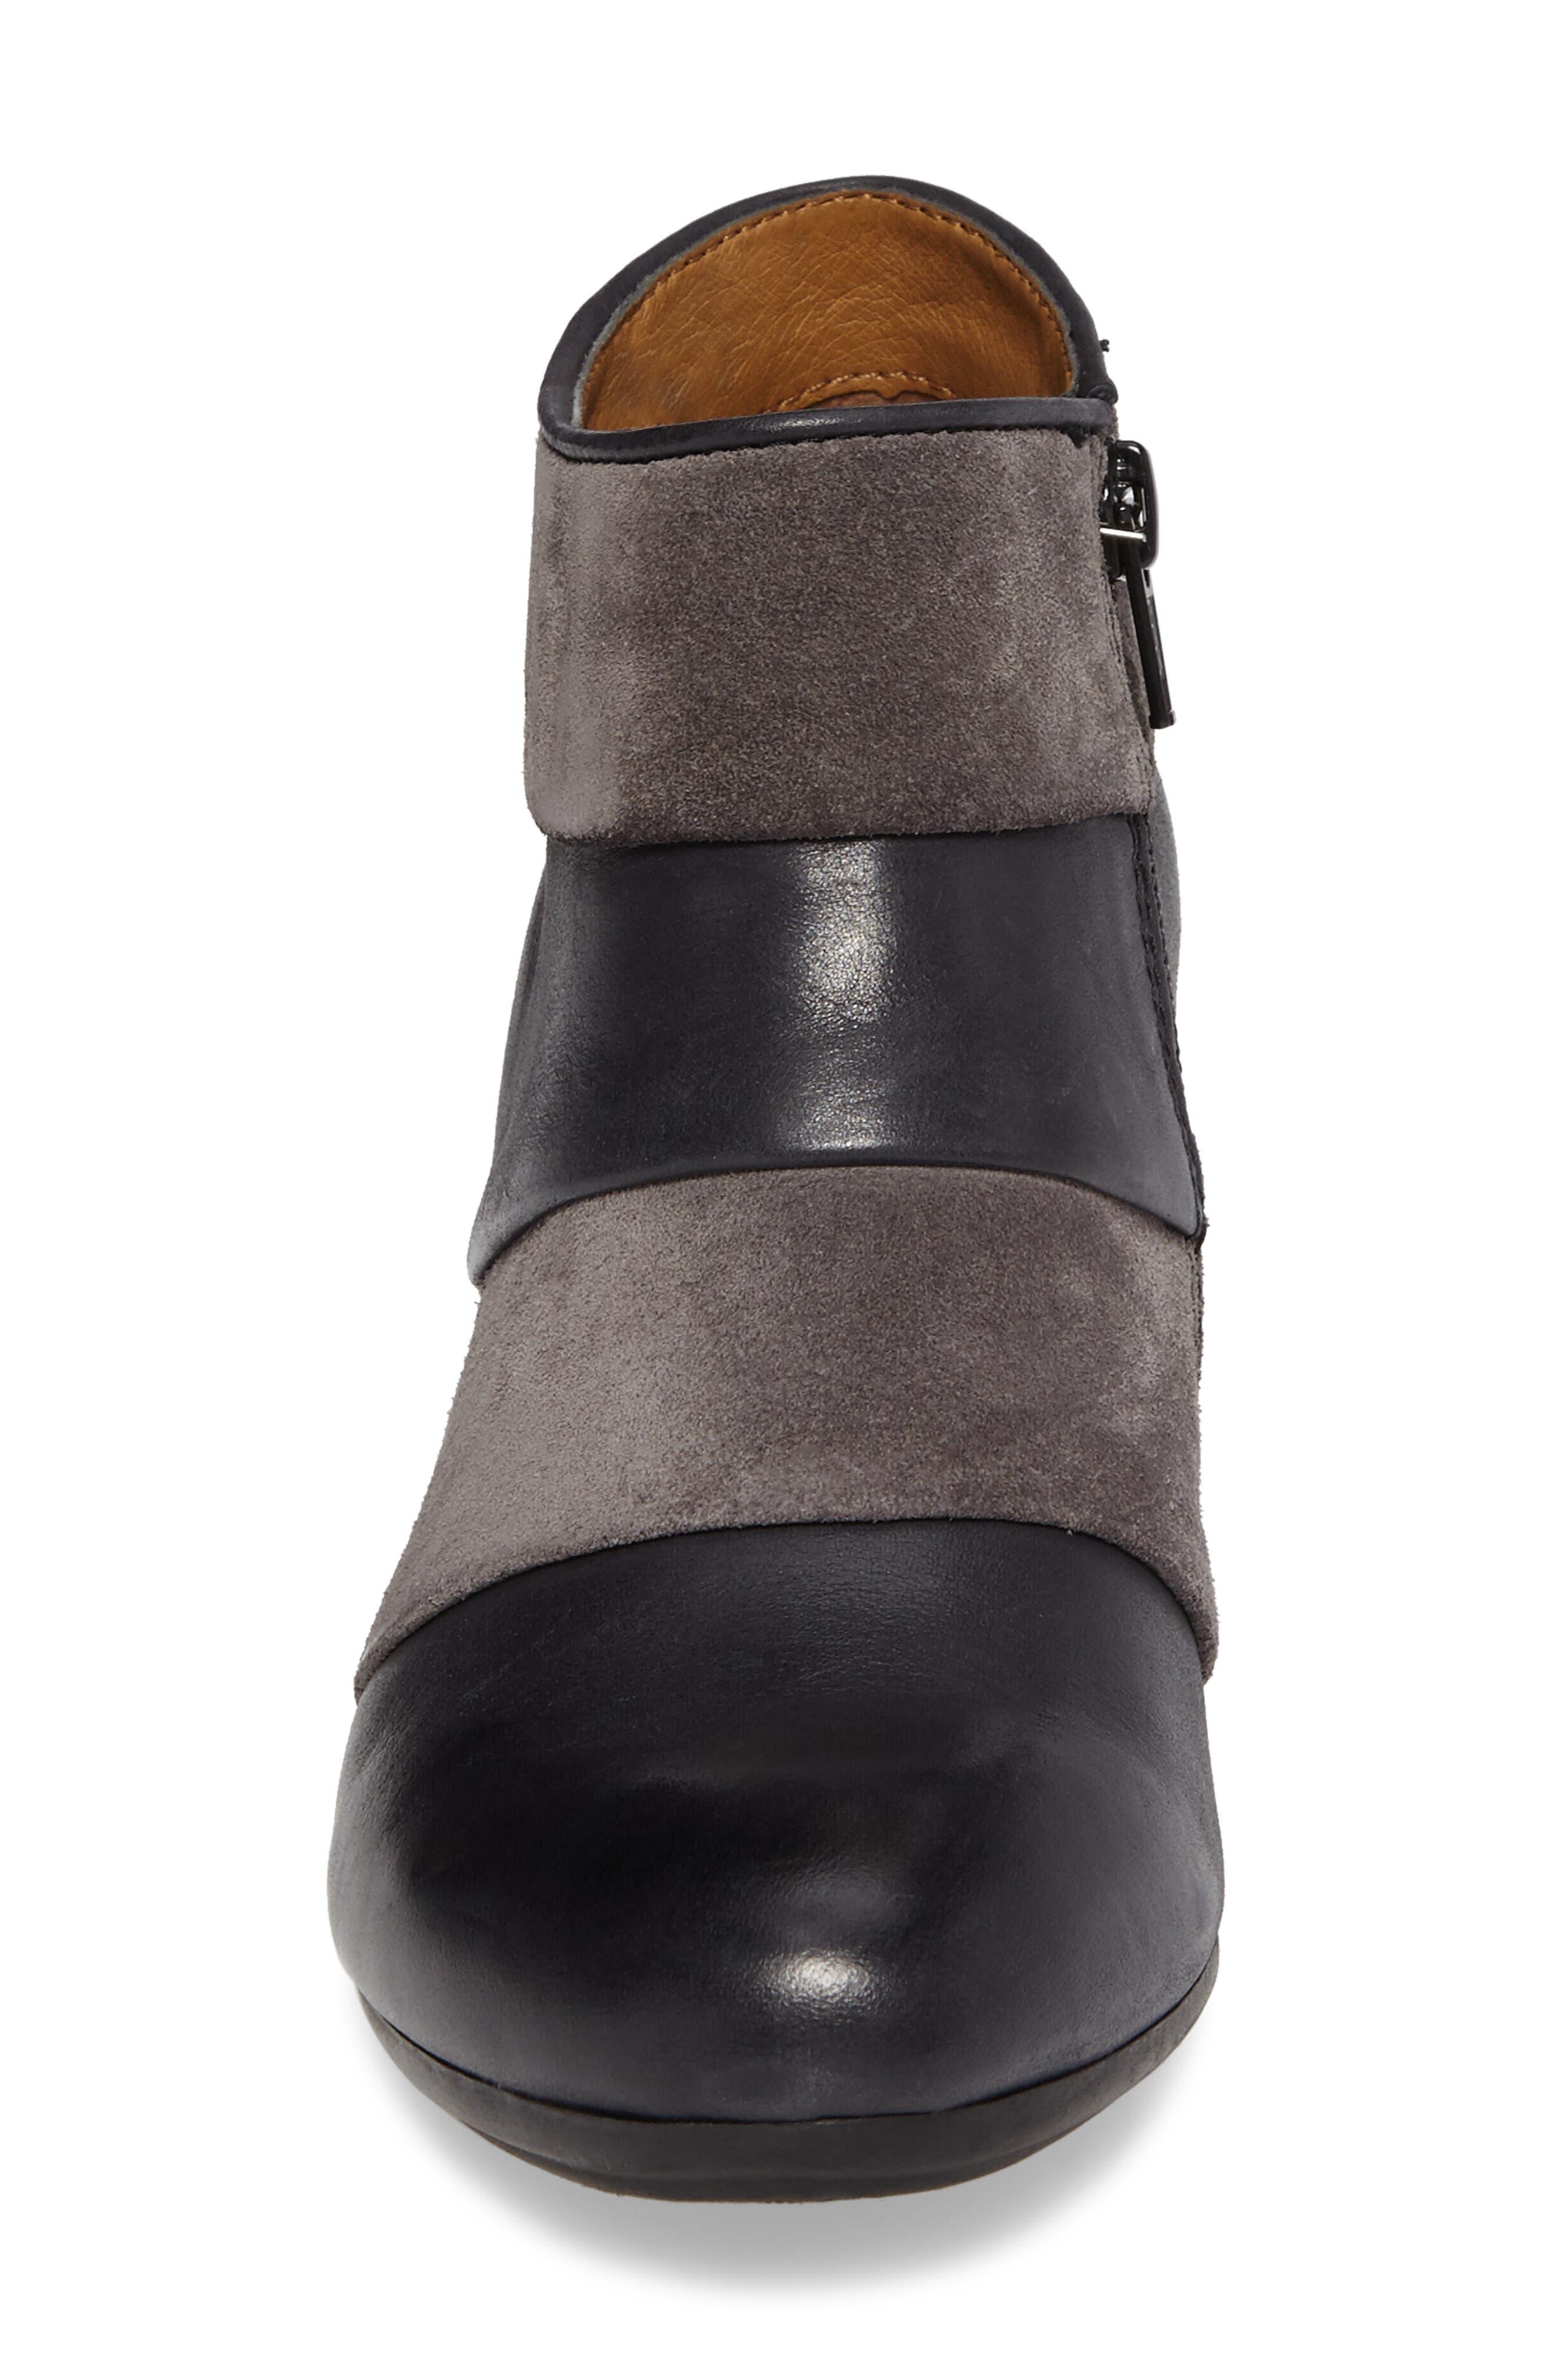 Amesbury Colorblock Bootie,                             Alternate thumbnail 4, color,                             Black/ Steel Grey Leather